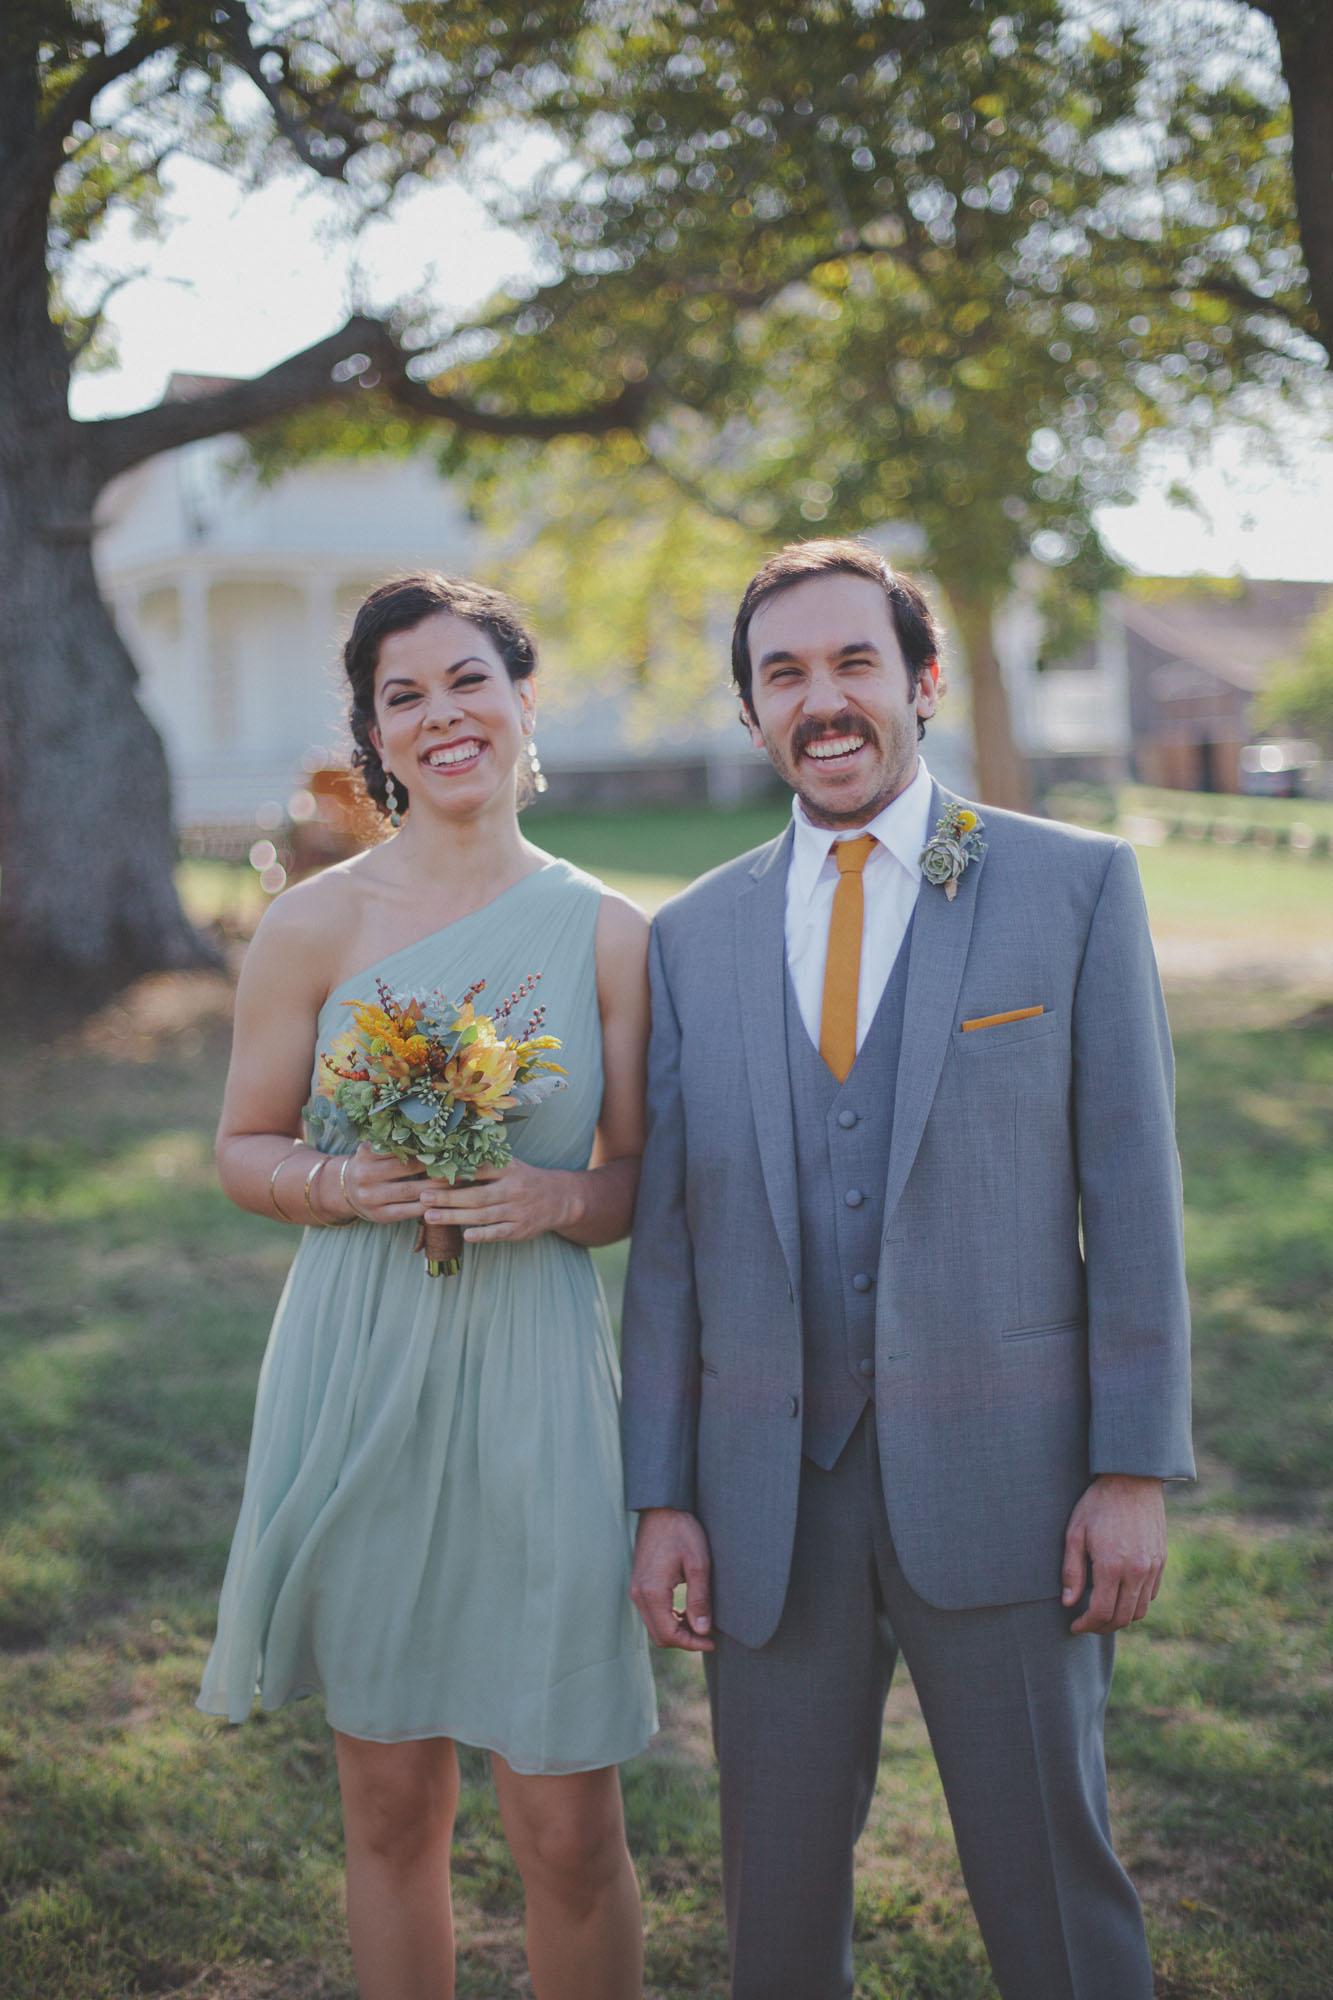 Gretchen_Gause_Petaluma_Olympias_Valley_Wedding_Photo-113.jpg